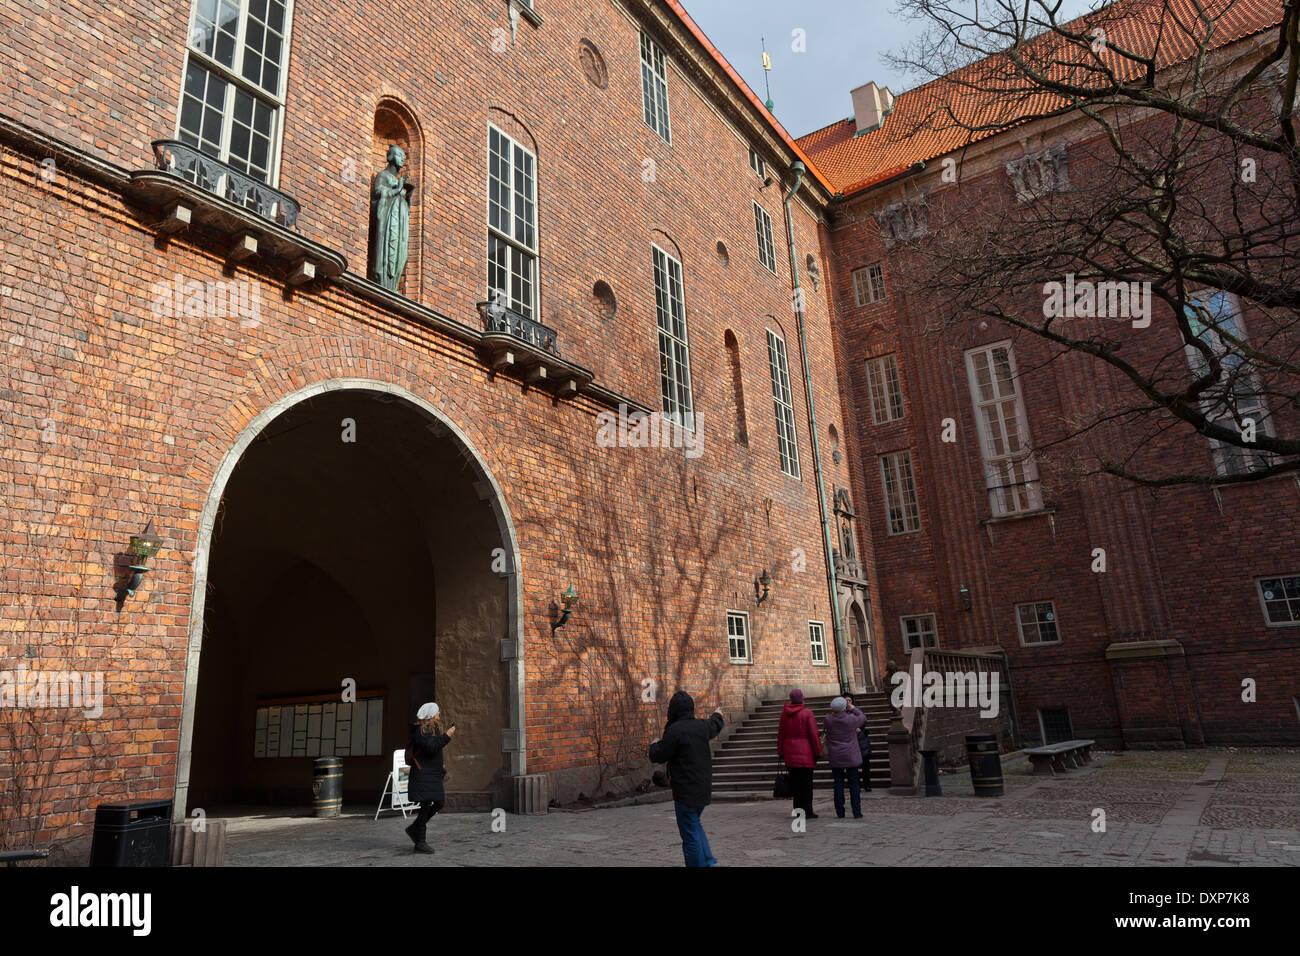 Stockholm, Sweden - Stadshuset (City Hall), guiding entrance wintertime from civic court, Kungsholmen - Stock Image